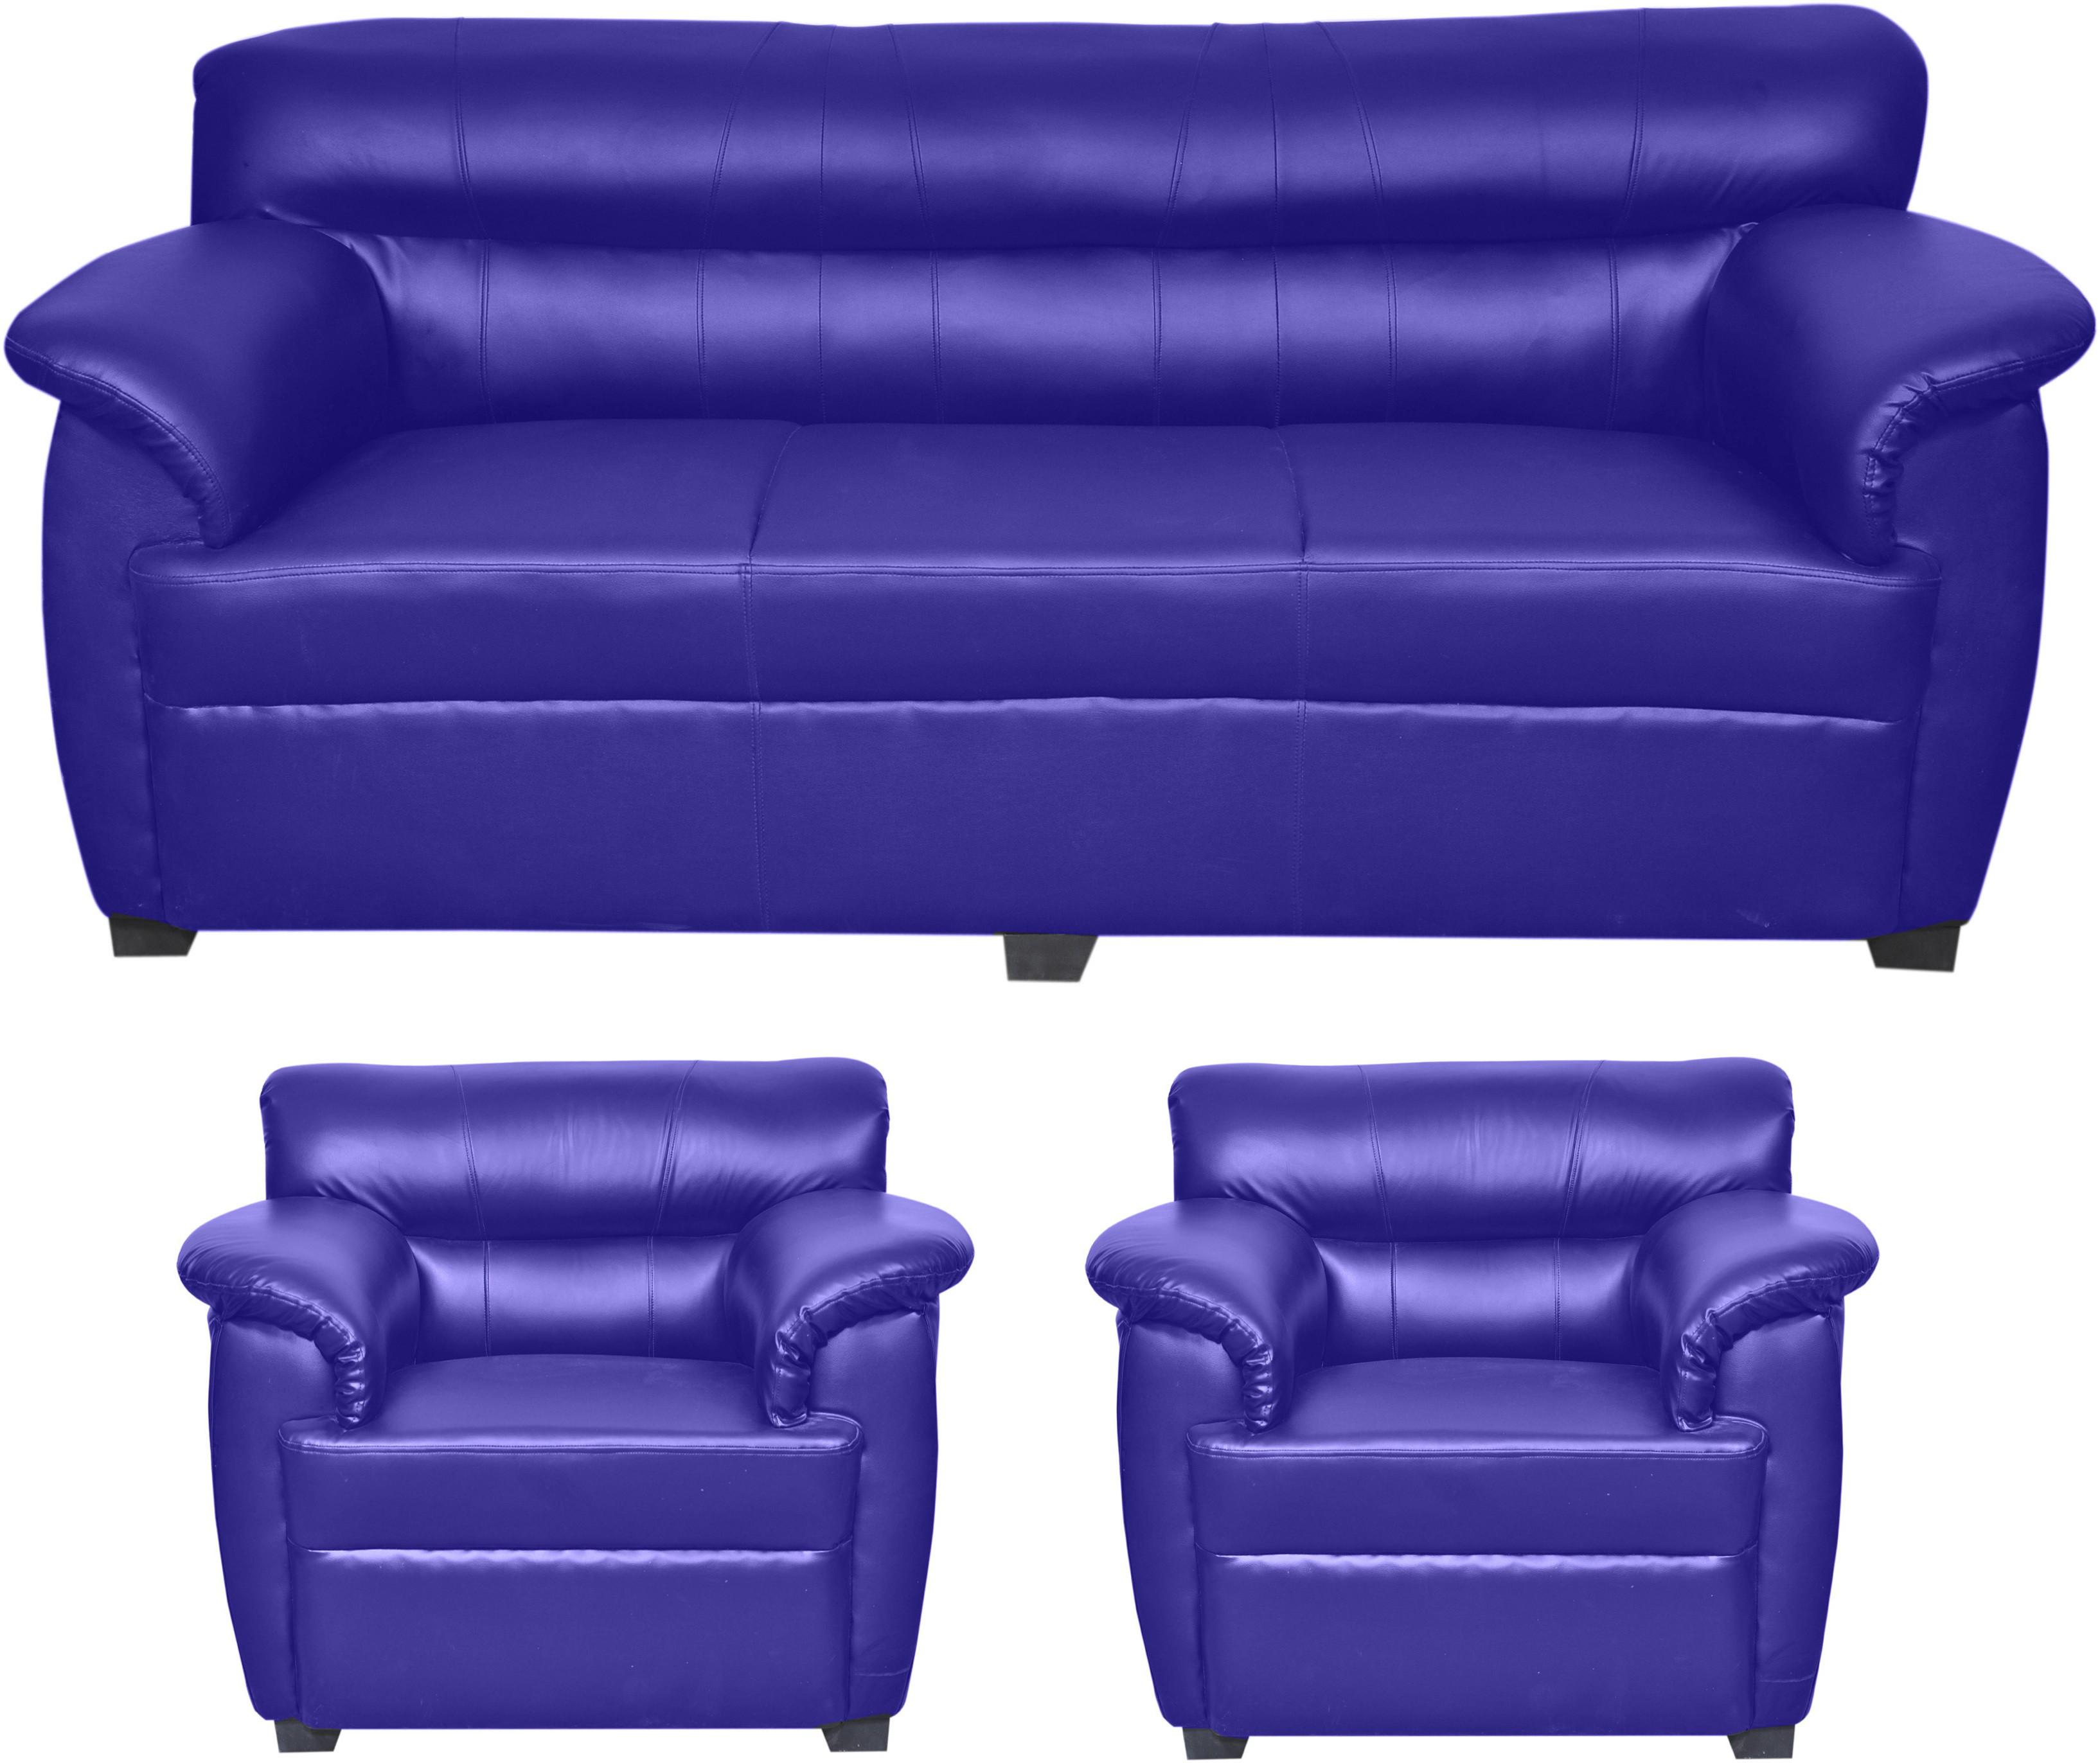 View HOMESTOCK Solid Wood 3 + 1 + 1 Blue Sofa Set(Configuration - Straight) Furniture (HOMESTOCK)